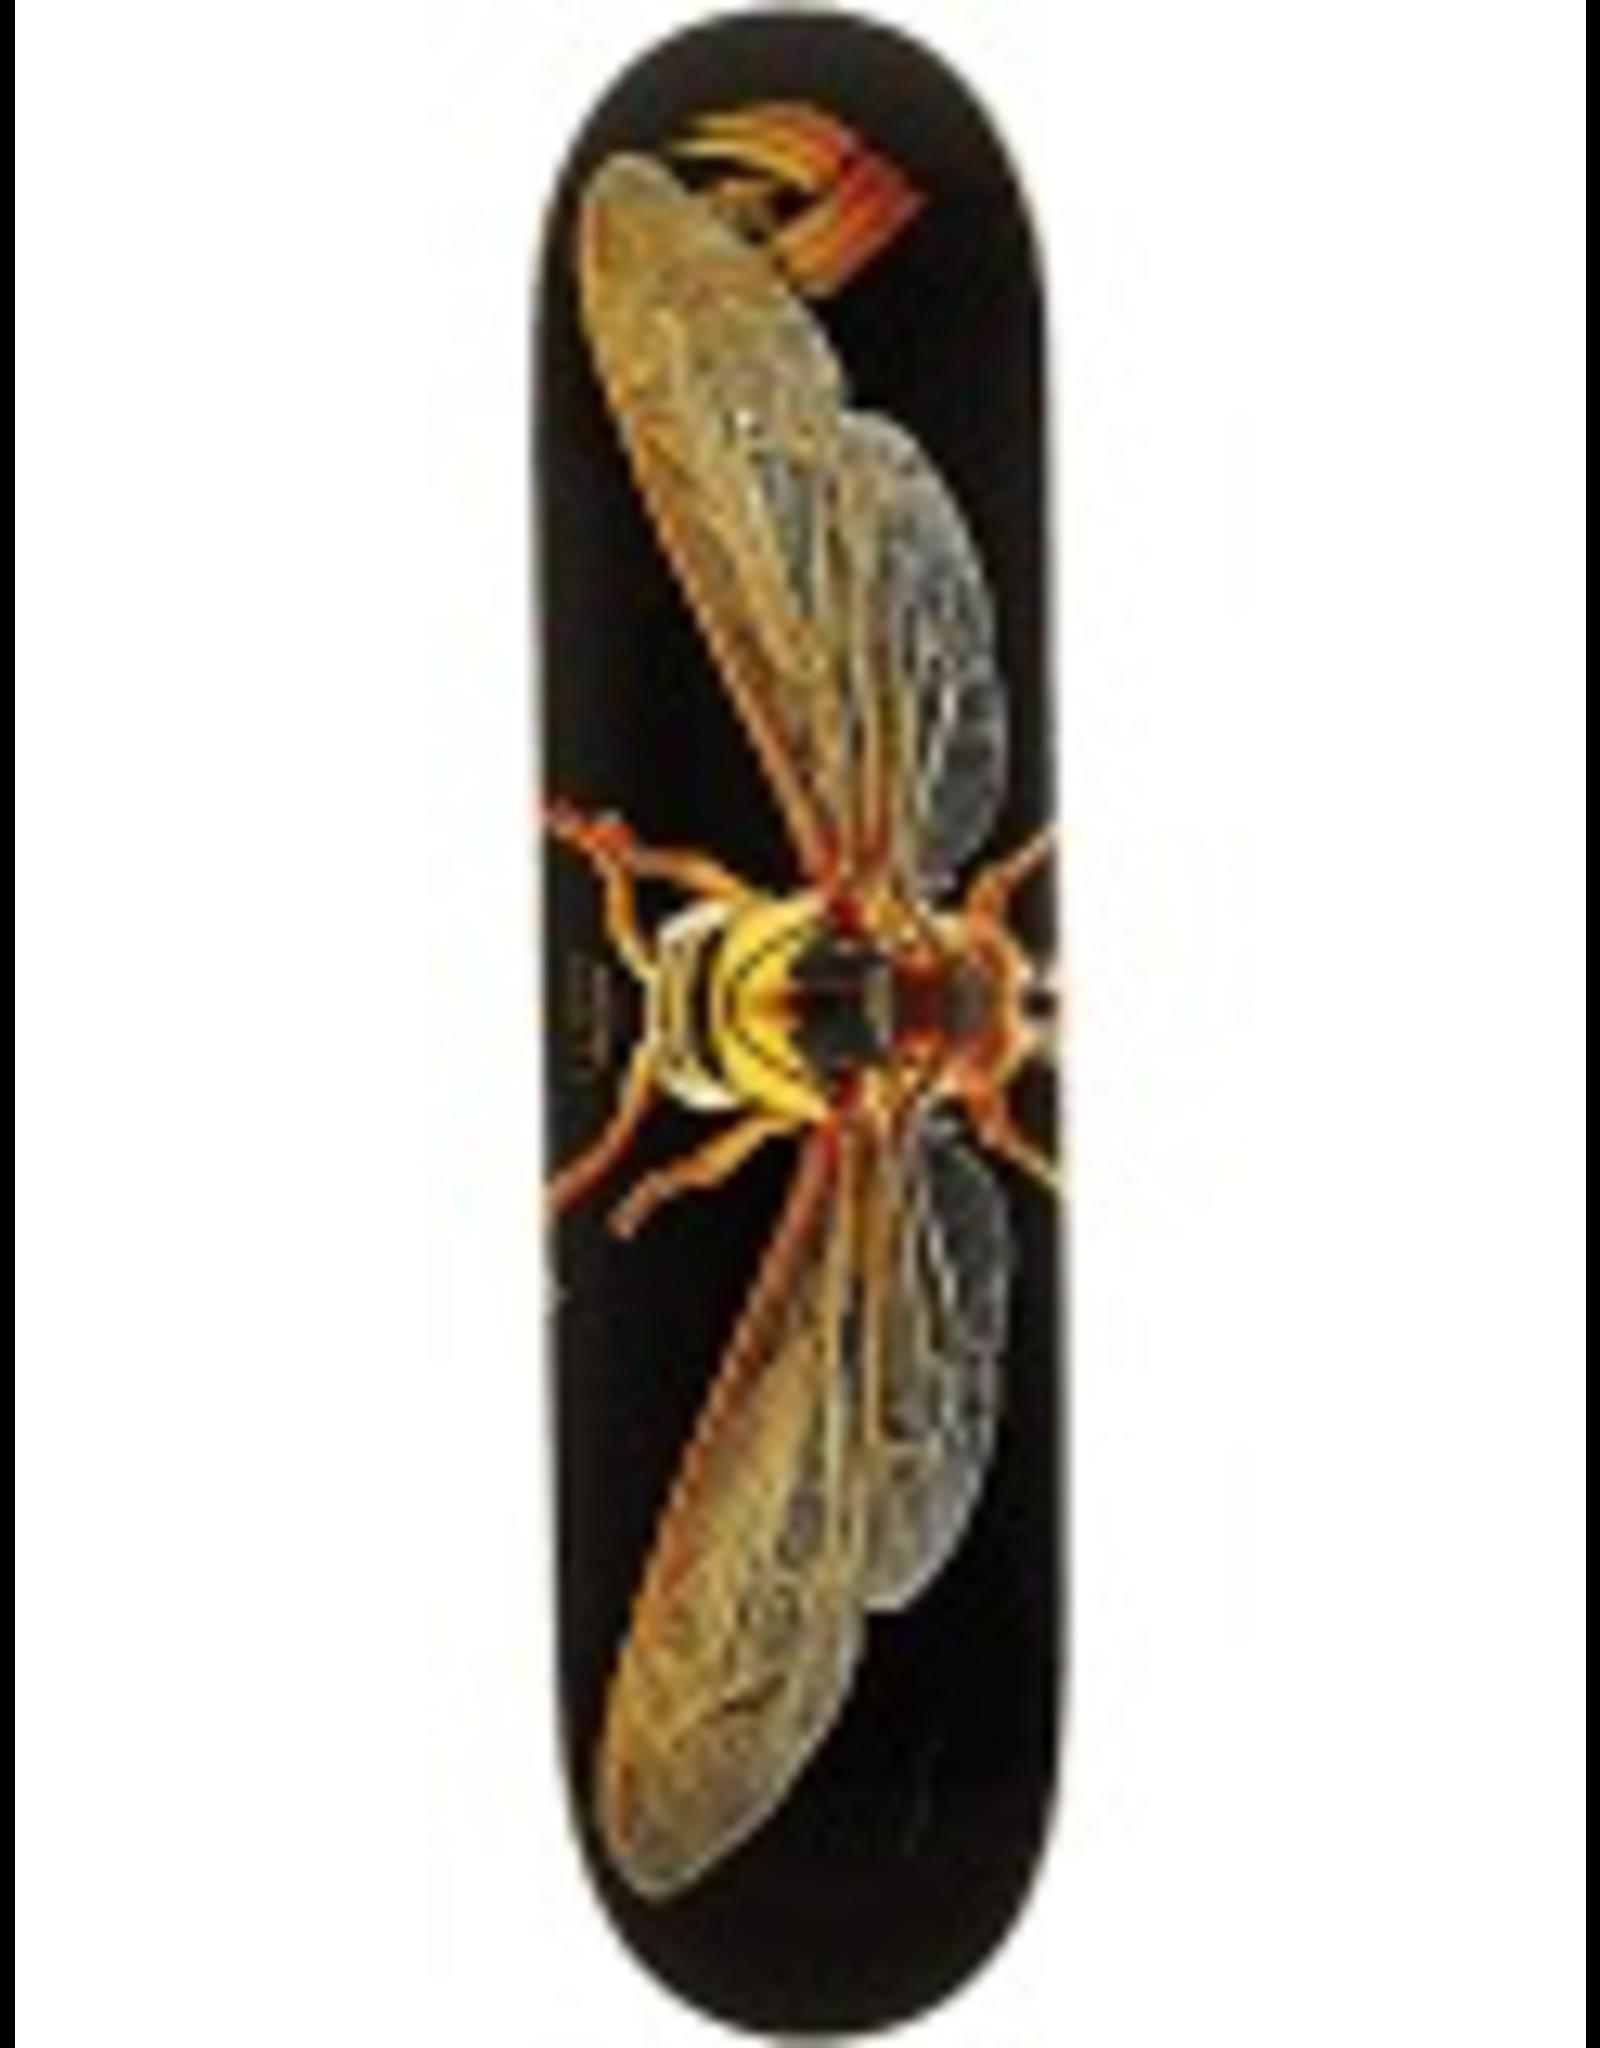 POWELL Powell Peralta Flight® Skateboard Deck BISS Potter Wasp - Shape 247 - 8 x 31.45